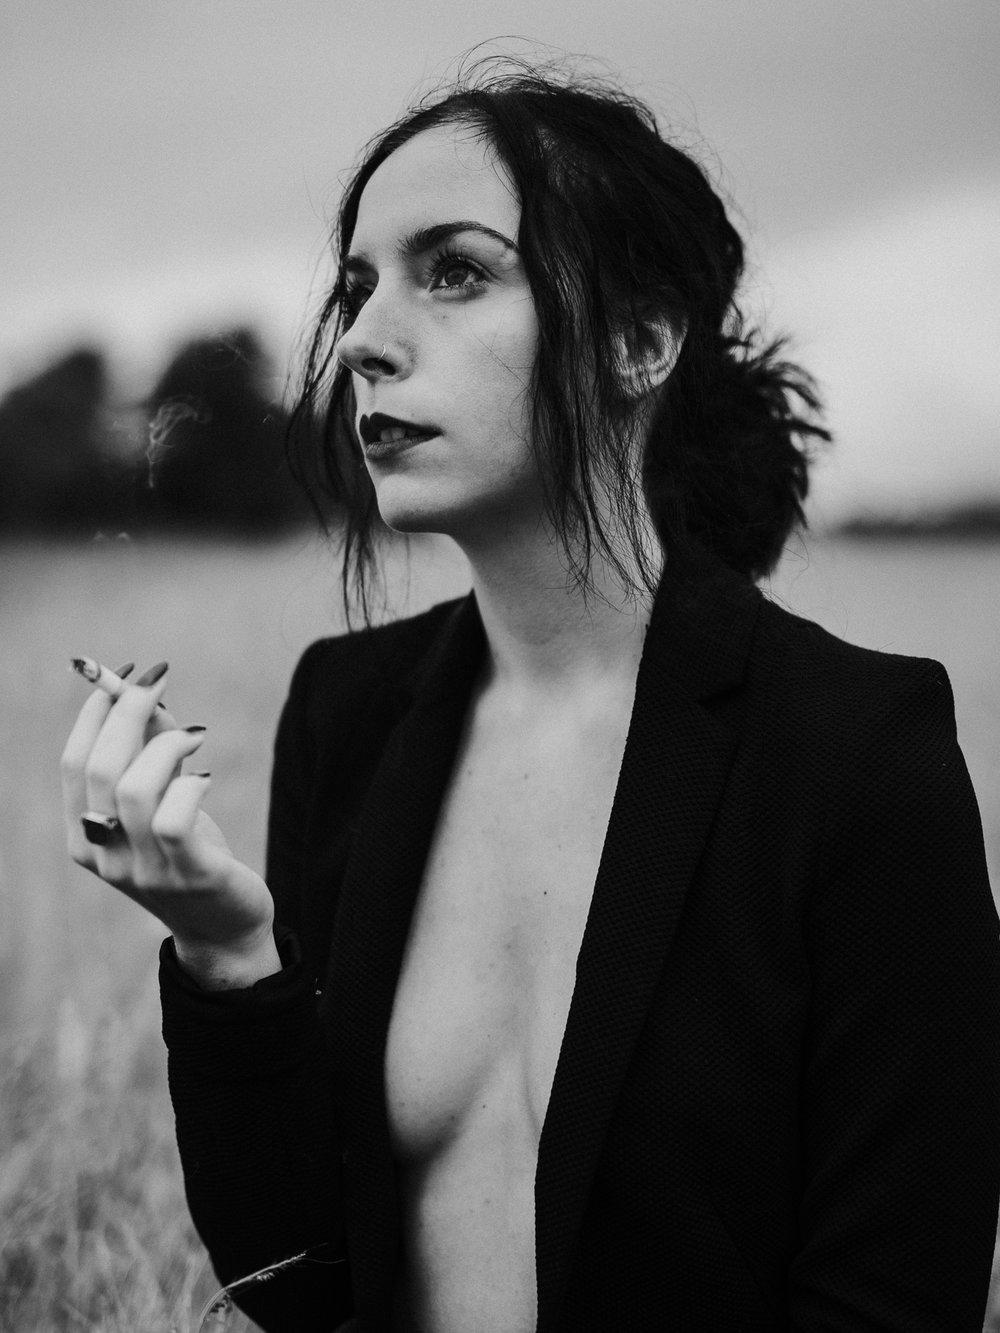 20170911_photo_ksaversinkar_portret_vesna_teja_ristic_west_bw-IMG_0138.jpg